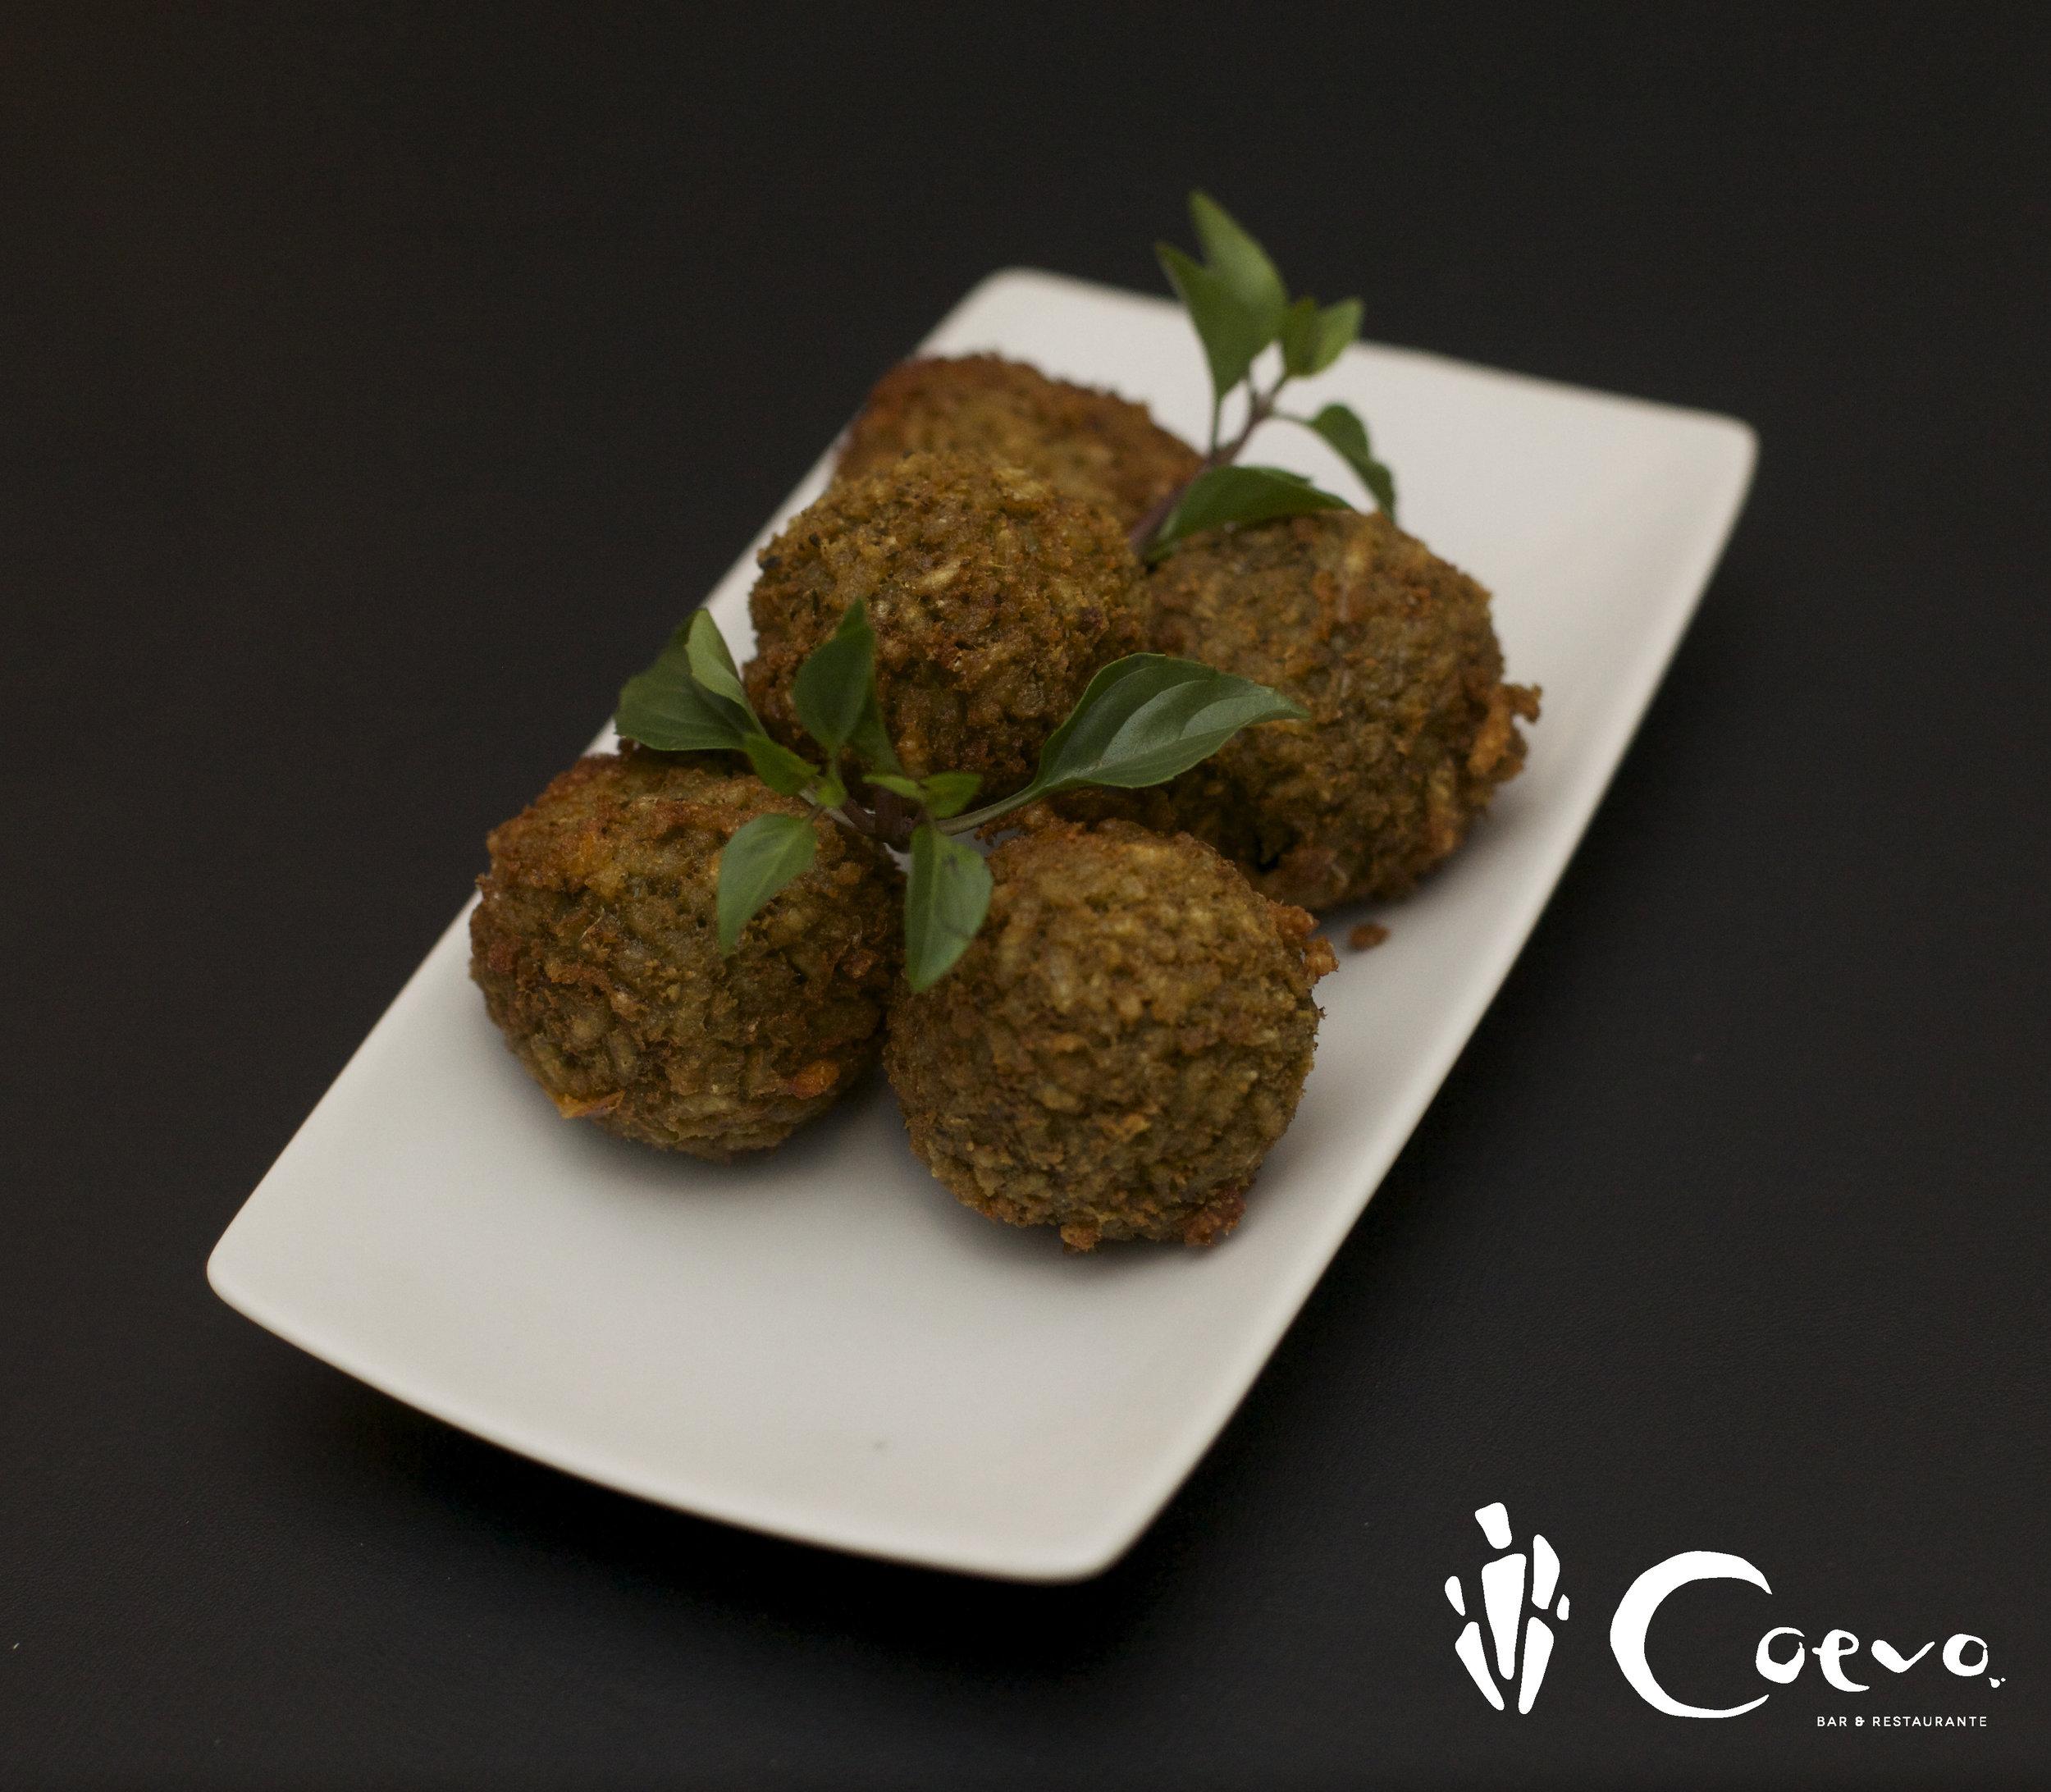 Coevo Bar & Restaurante